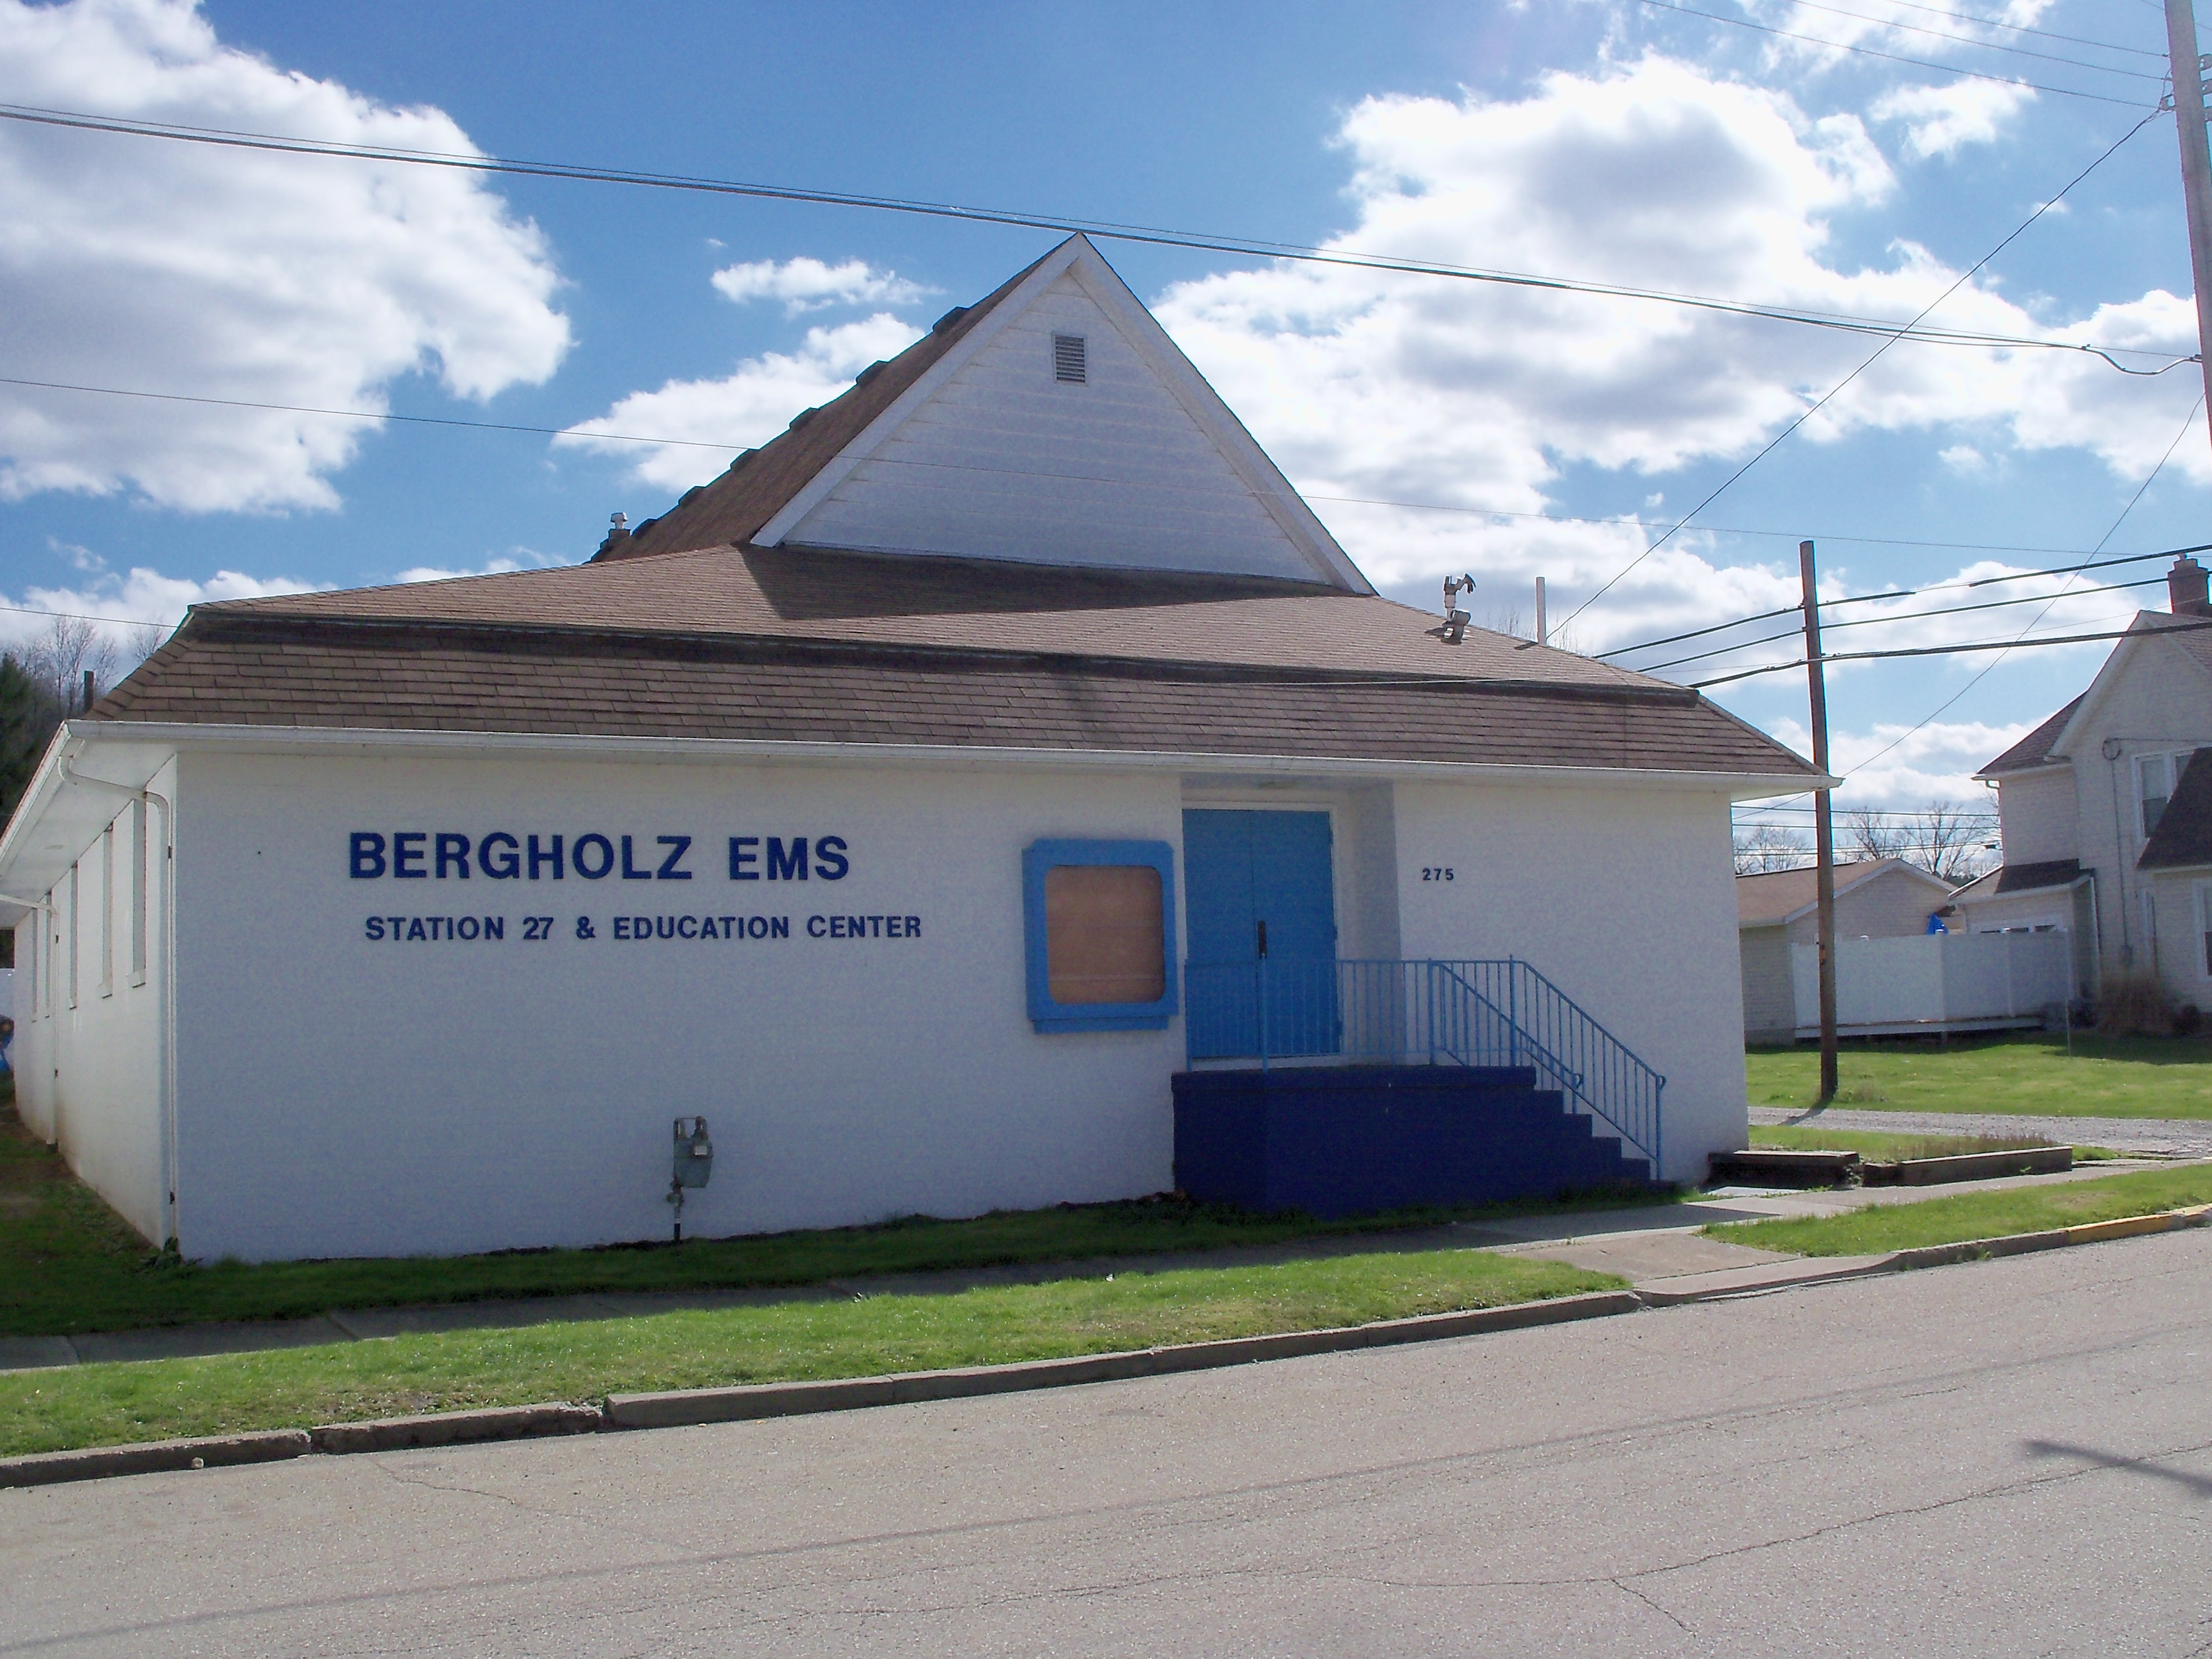 Ohio jefferson county bergholz - File Bergholz Ohio Ems Jpg